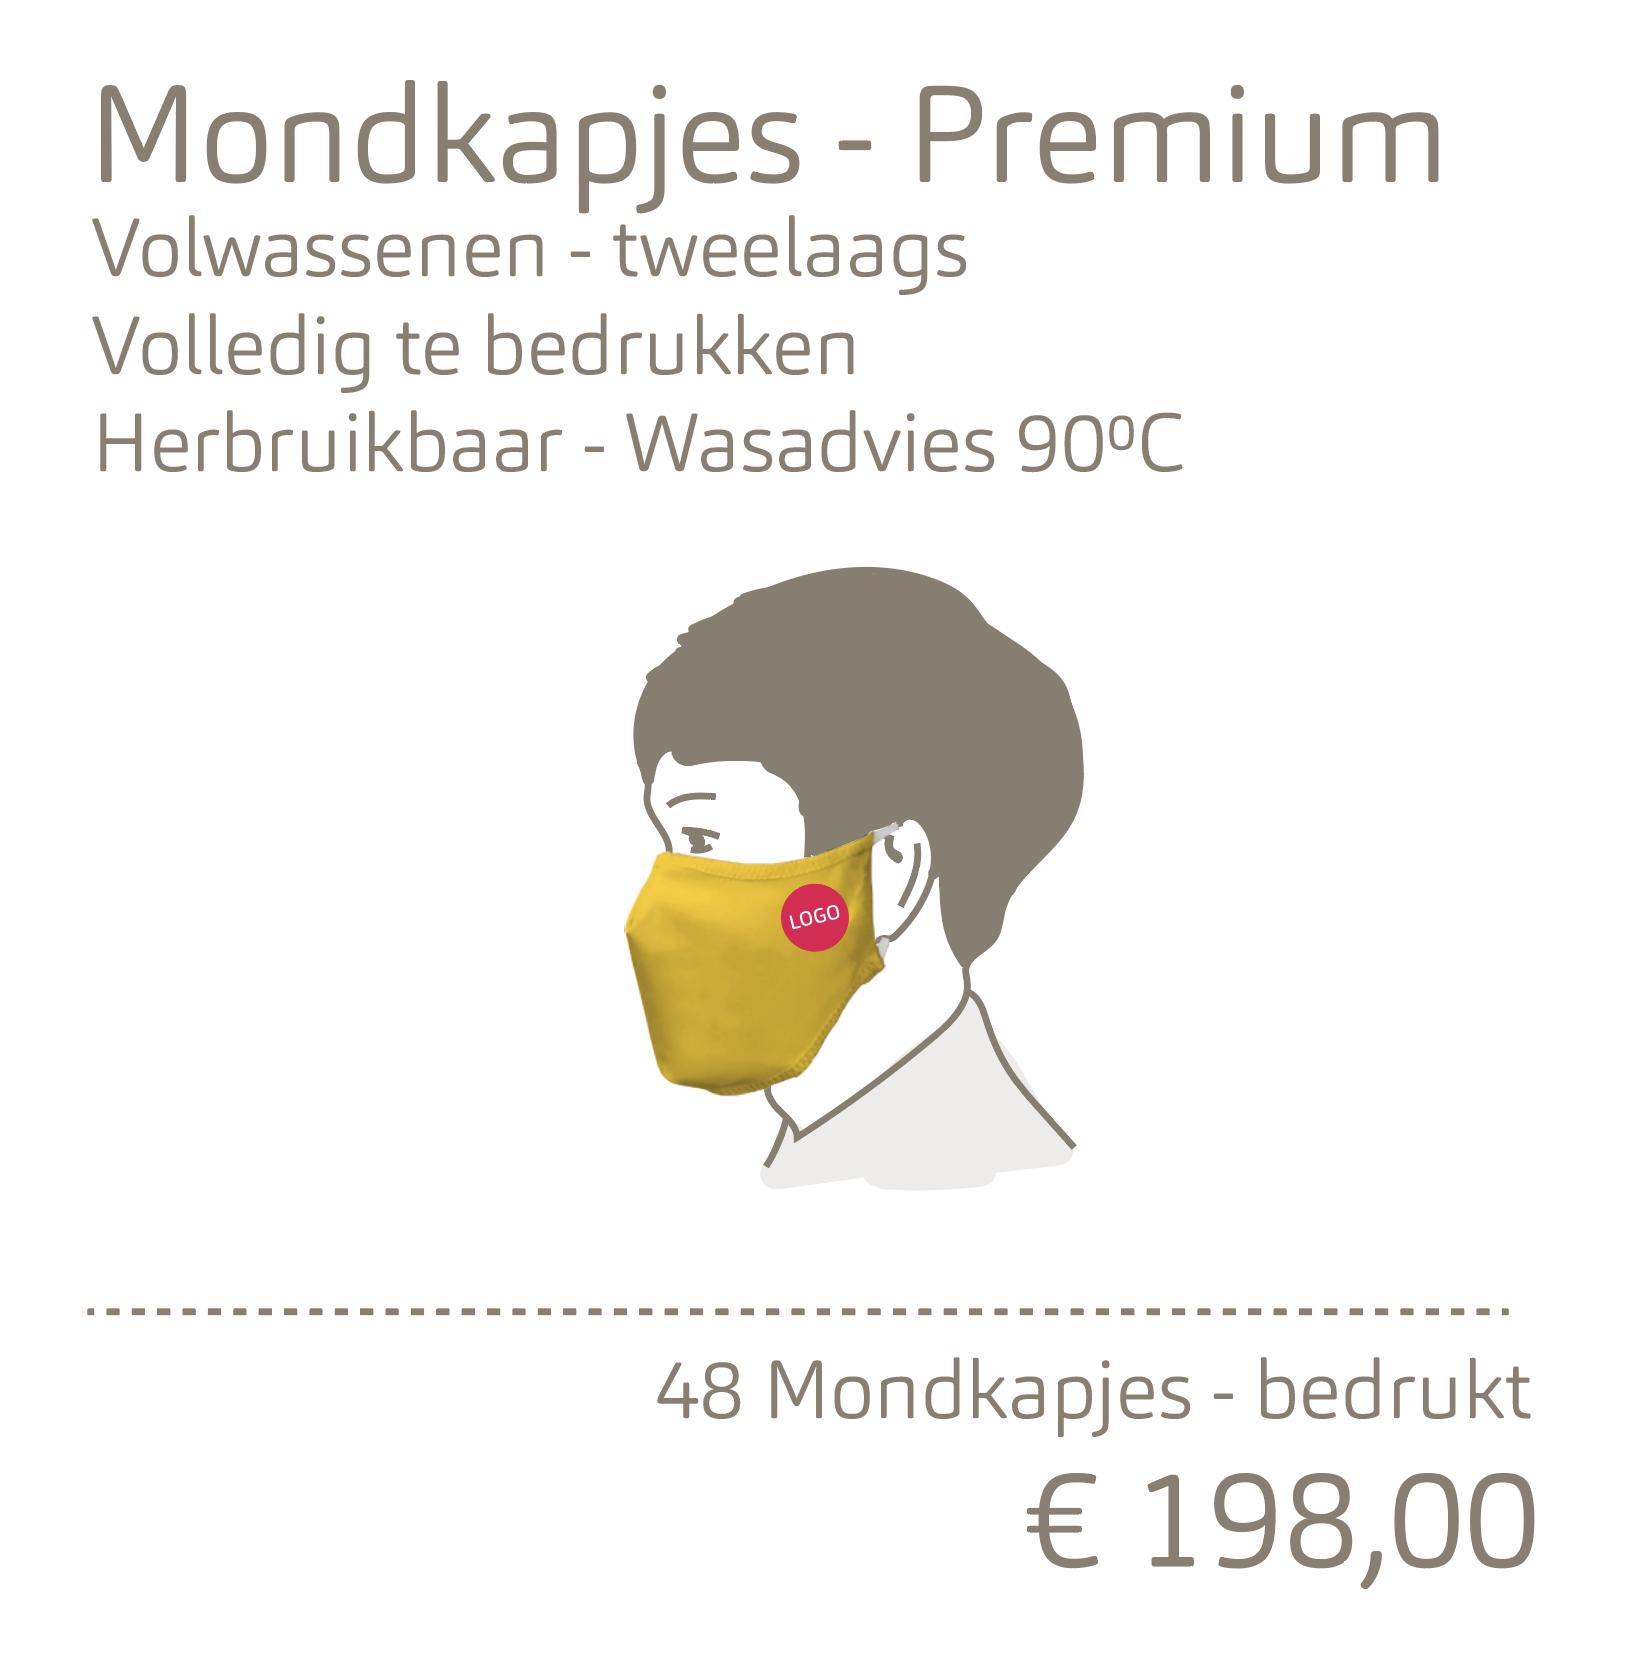 Mondkapjes-Premium